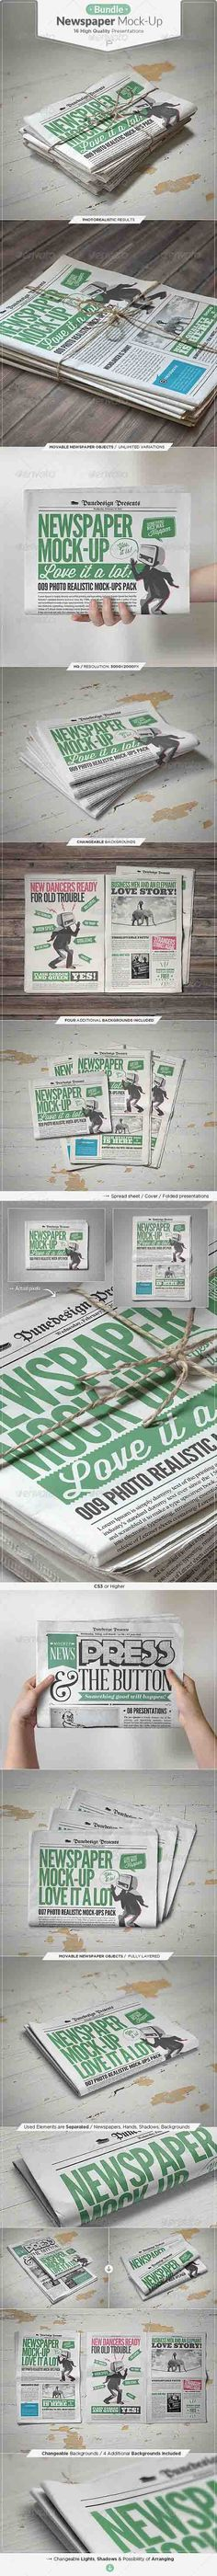 HeroGfx – Newspaper Mock-up Bundle » Free Special GFX Posts Vectors AEP Projects PSD Web Templates   HeroGFX.com